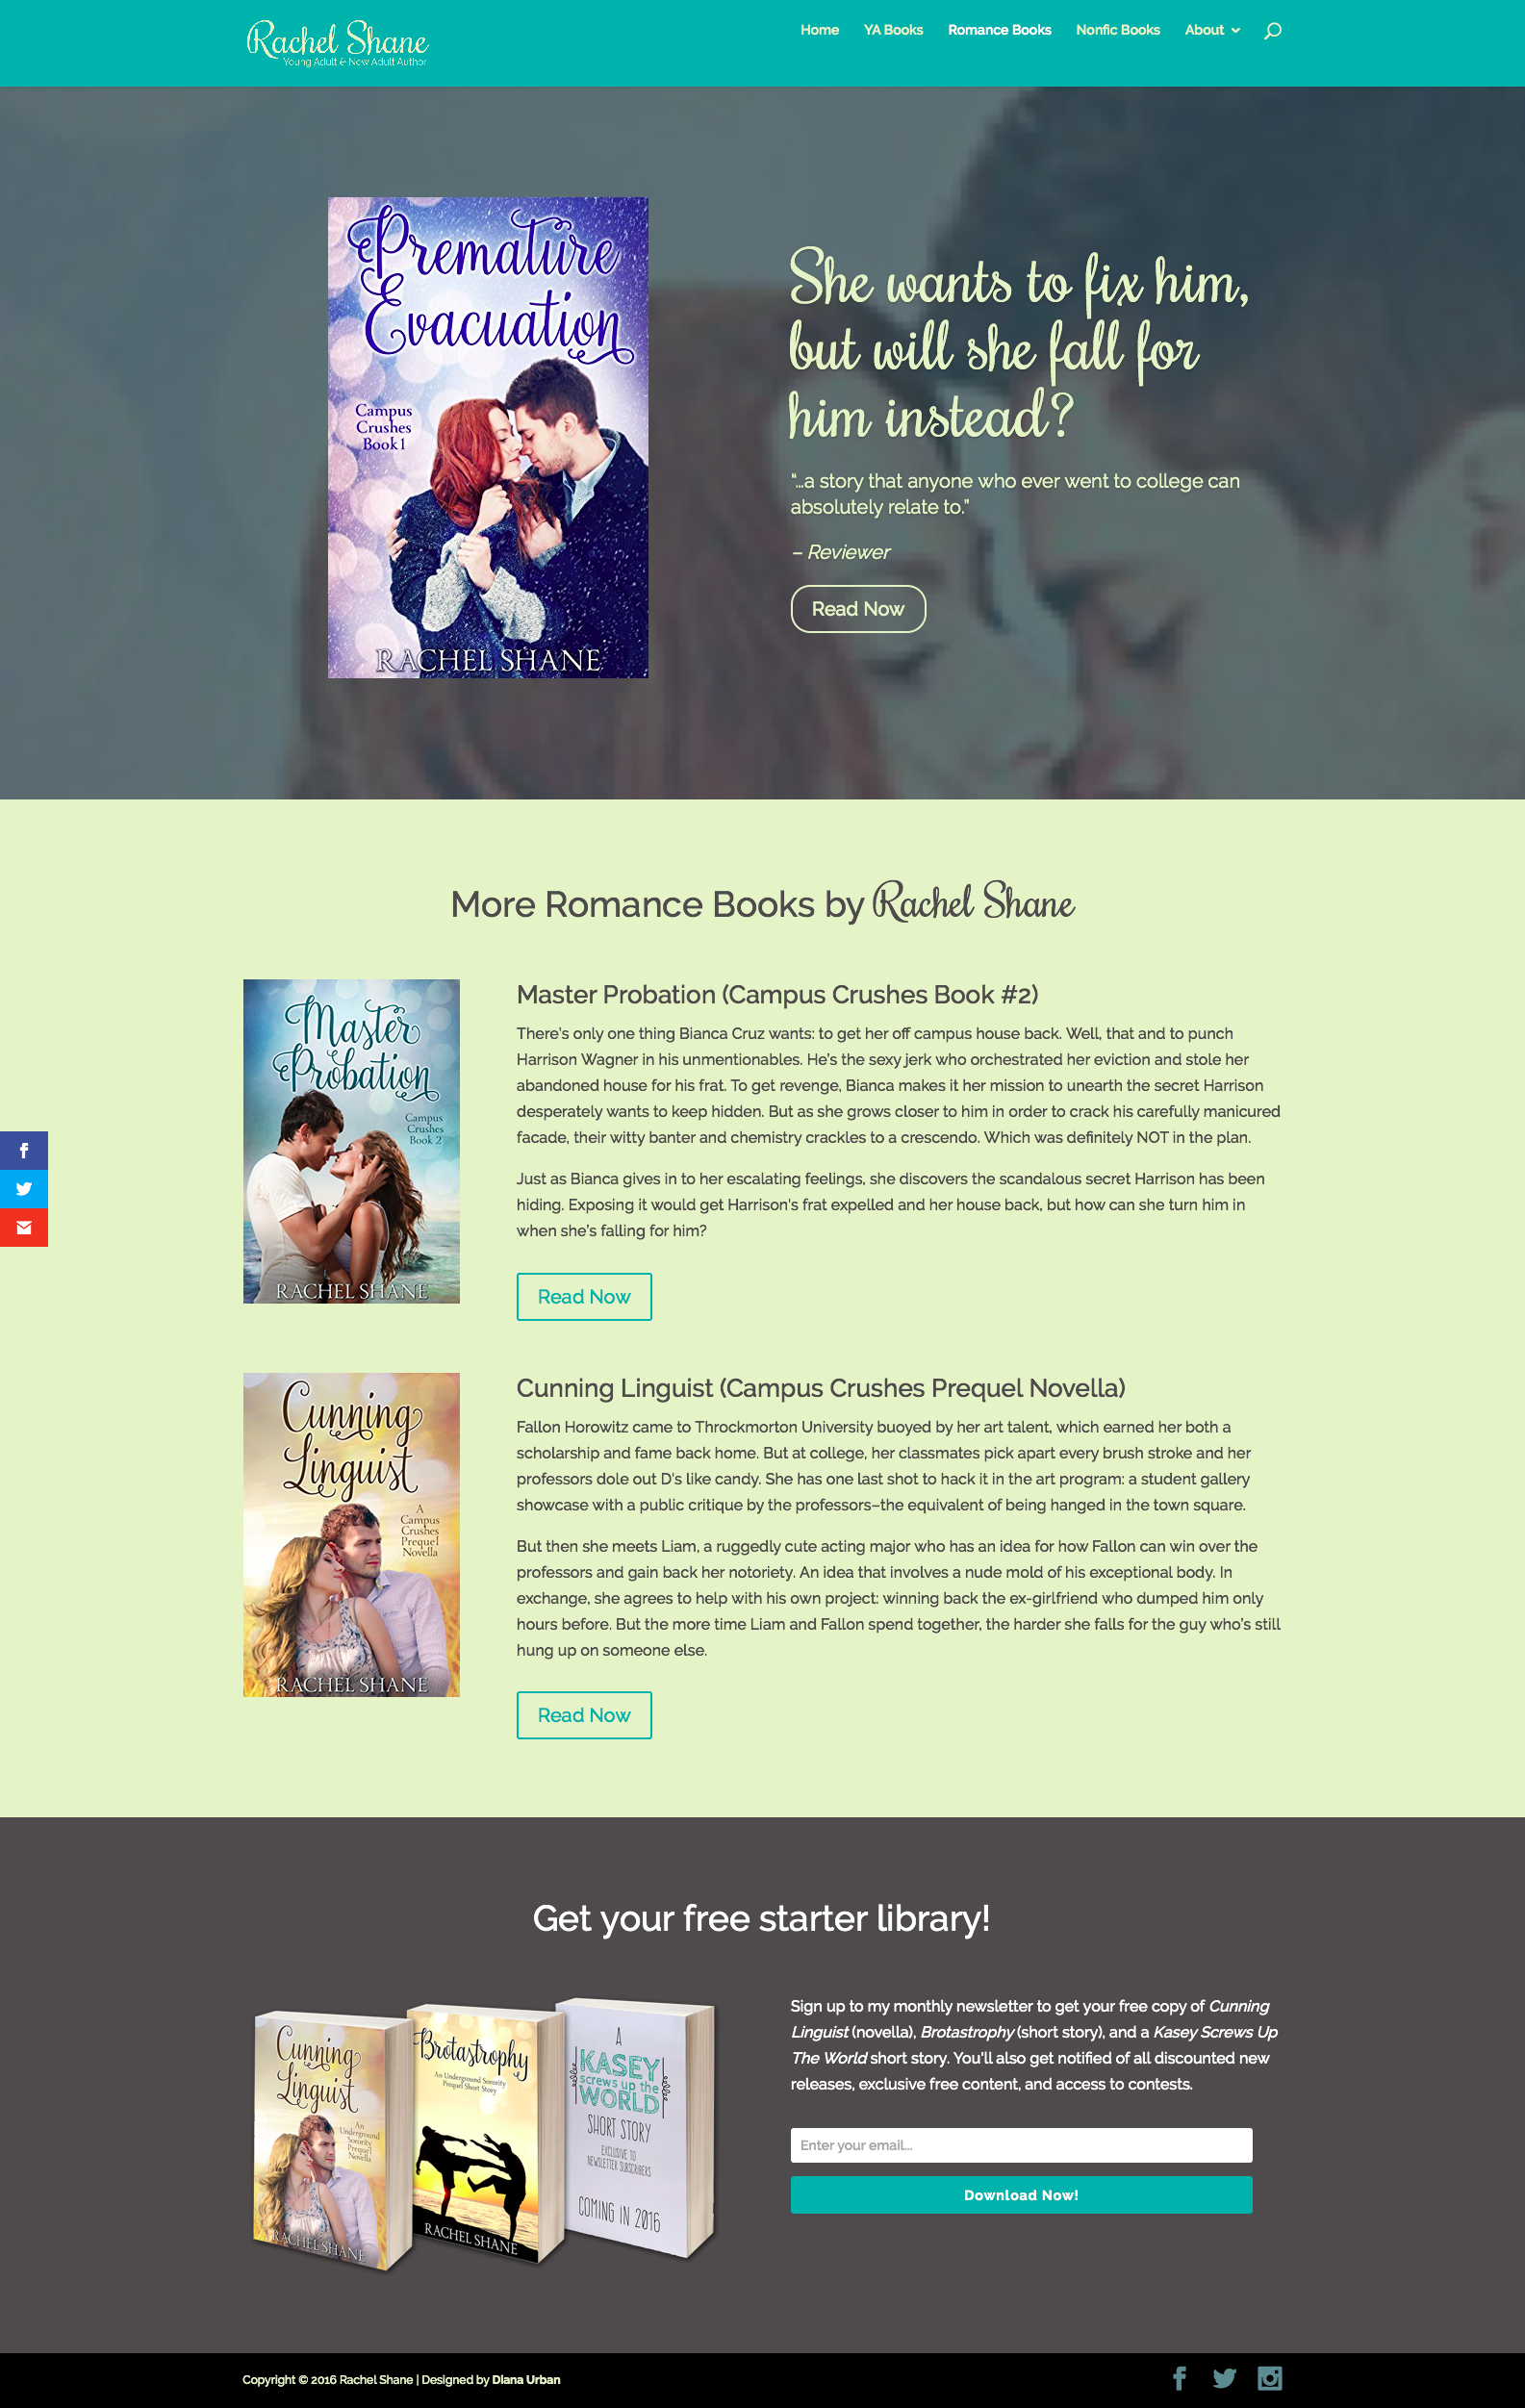 Rachel Shane's Romance Books